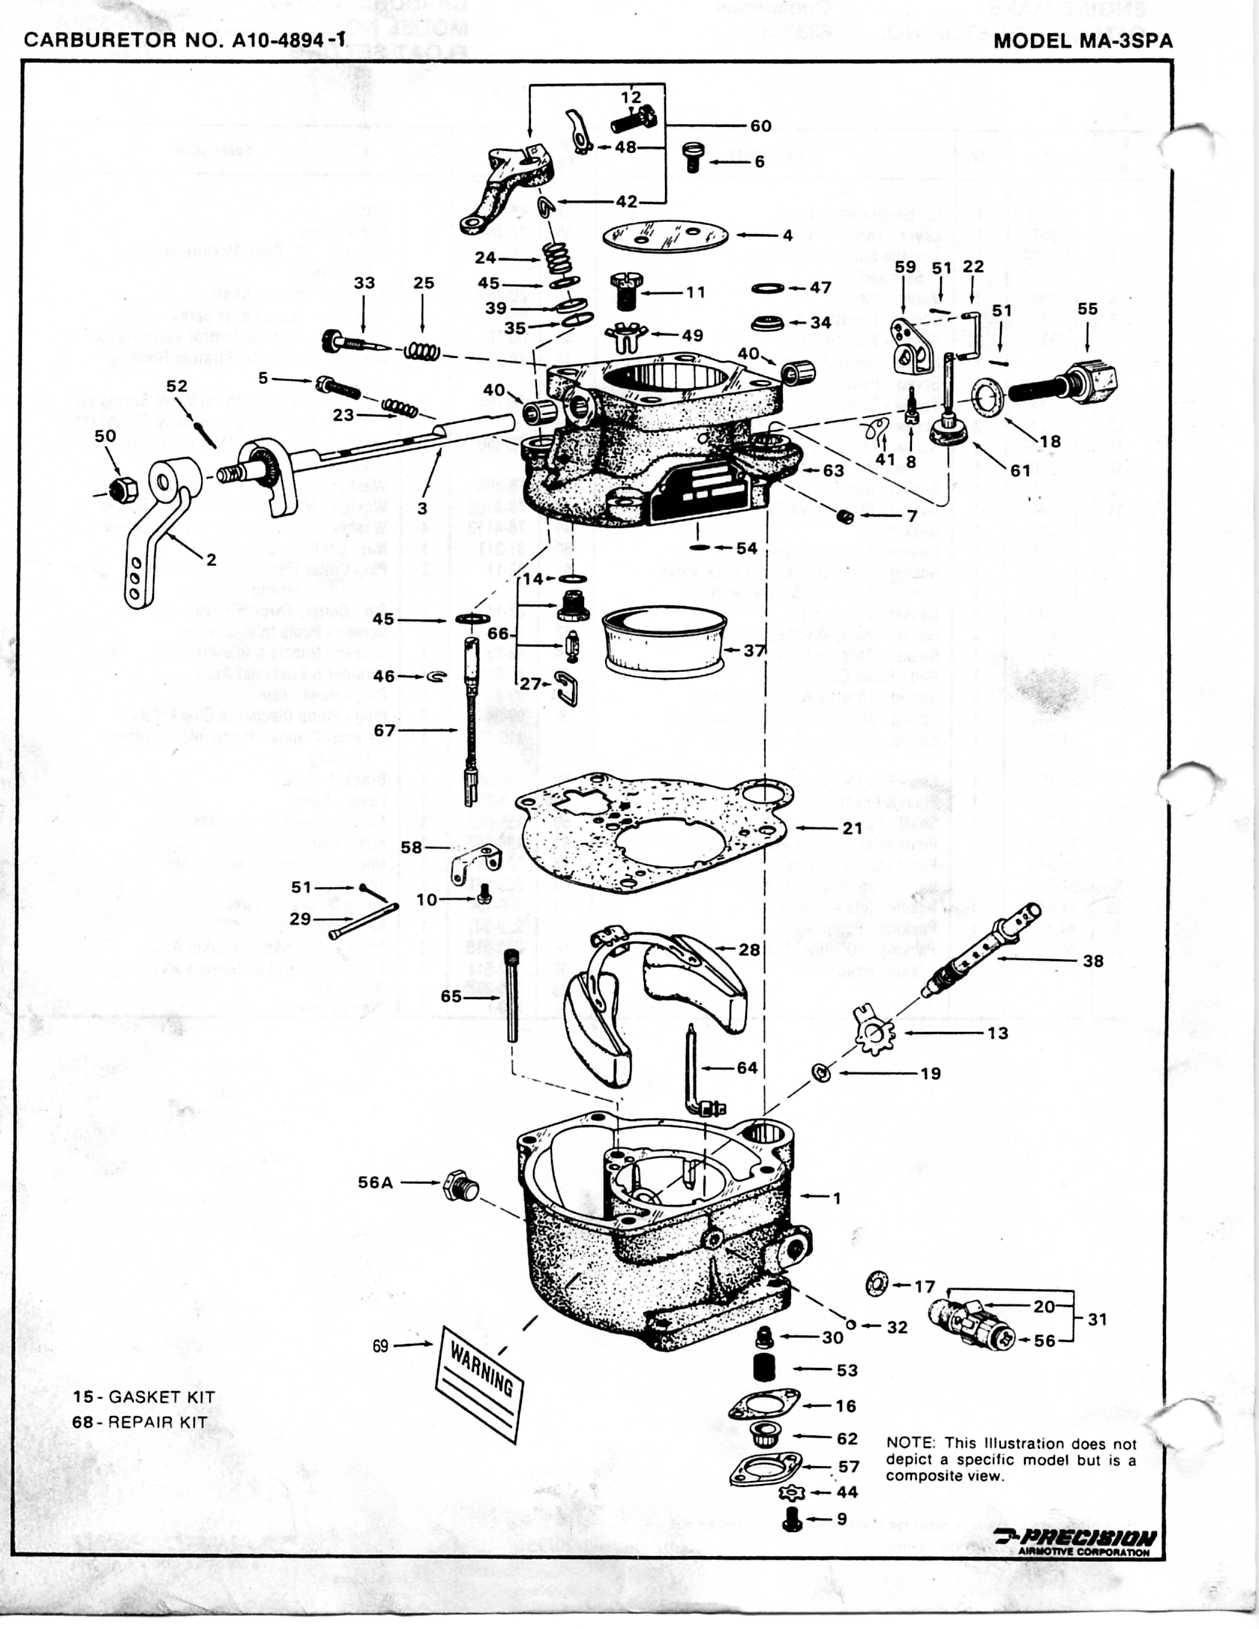 Marvel Schebler Aircraft Carburetor Service Manual